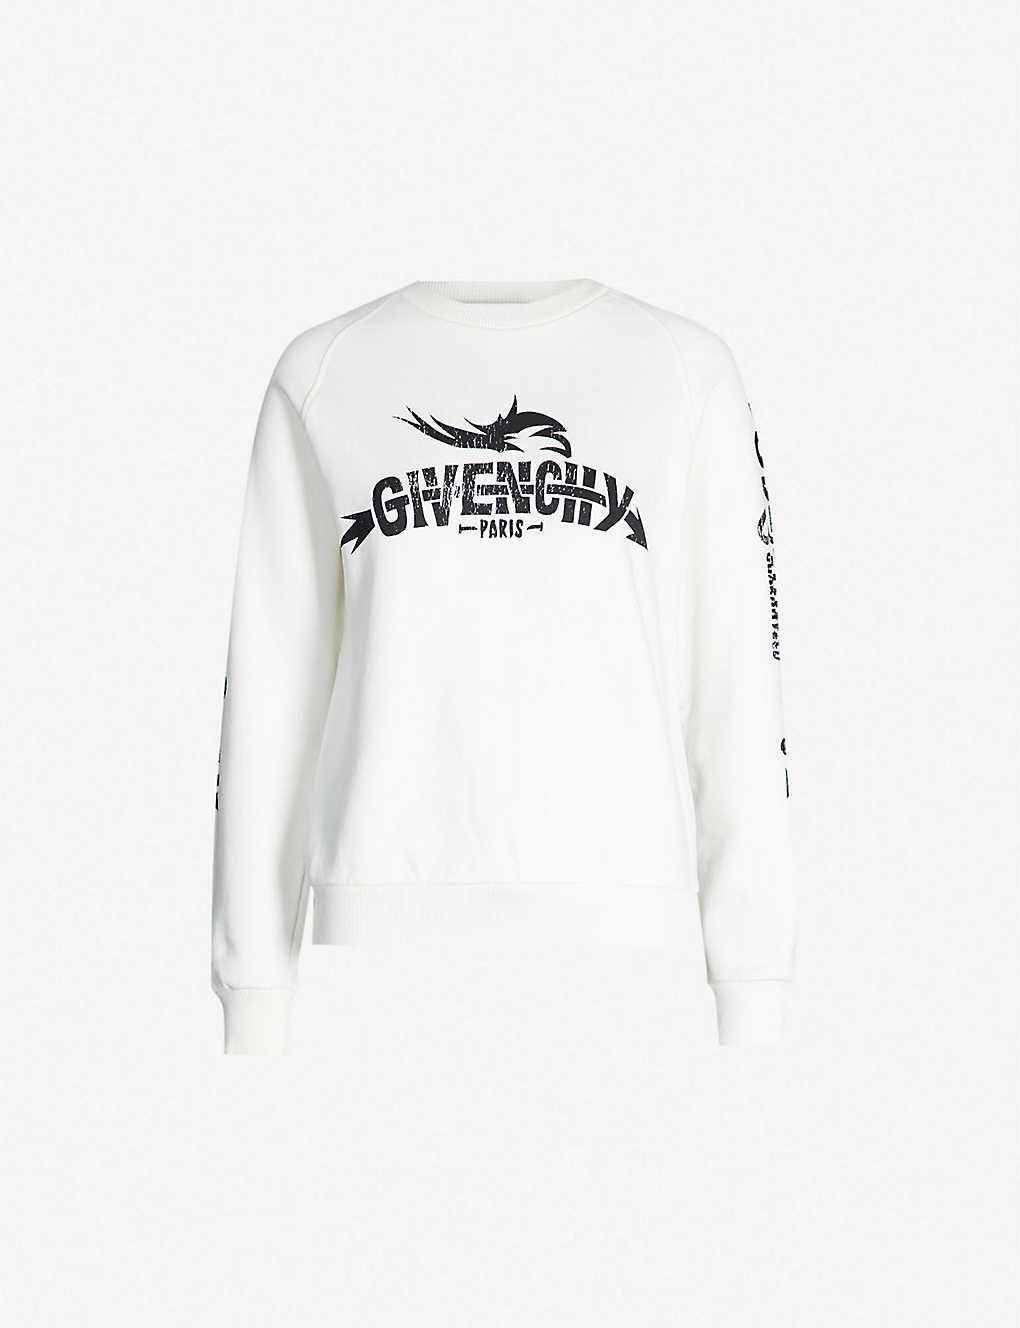 bfb54eb1b82c1 GIVENCHY - Taurus cotton-jersey sweatshirt | Selfridges.com